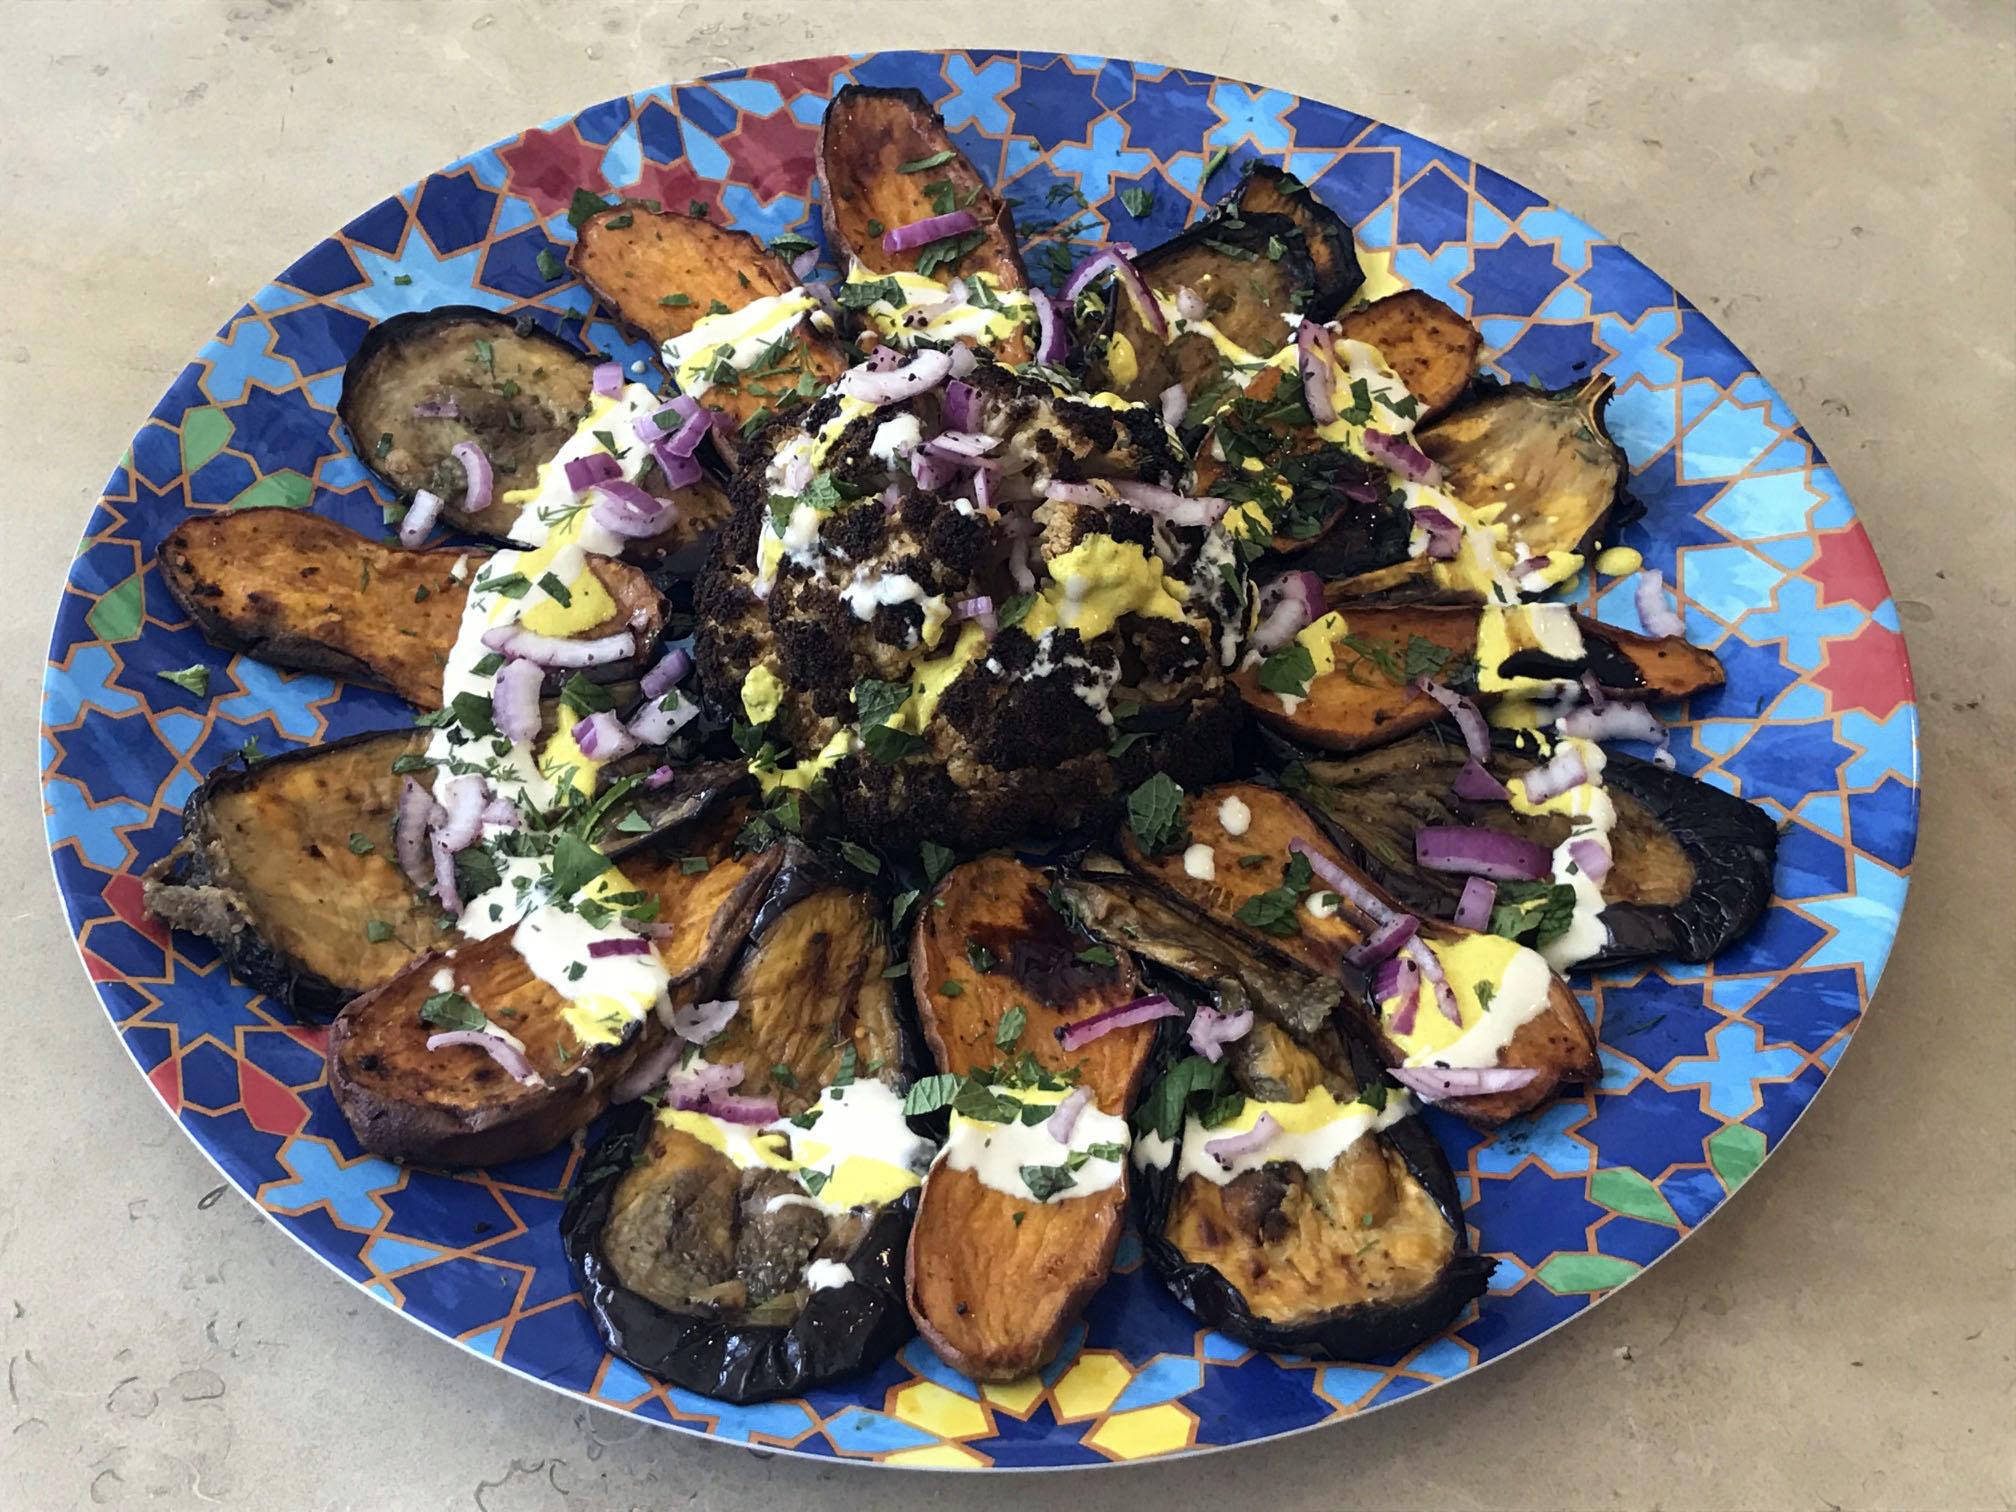 Faith Kramer's Tel Aviv-inspired Roasted Cauliflower with Vegetables and Sauces